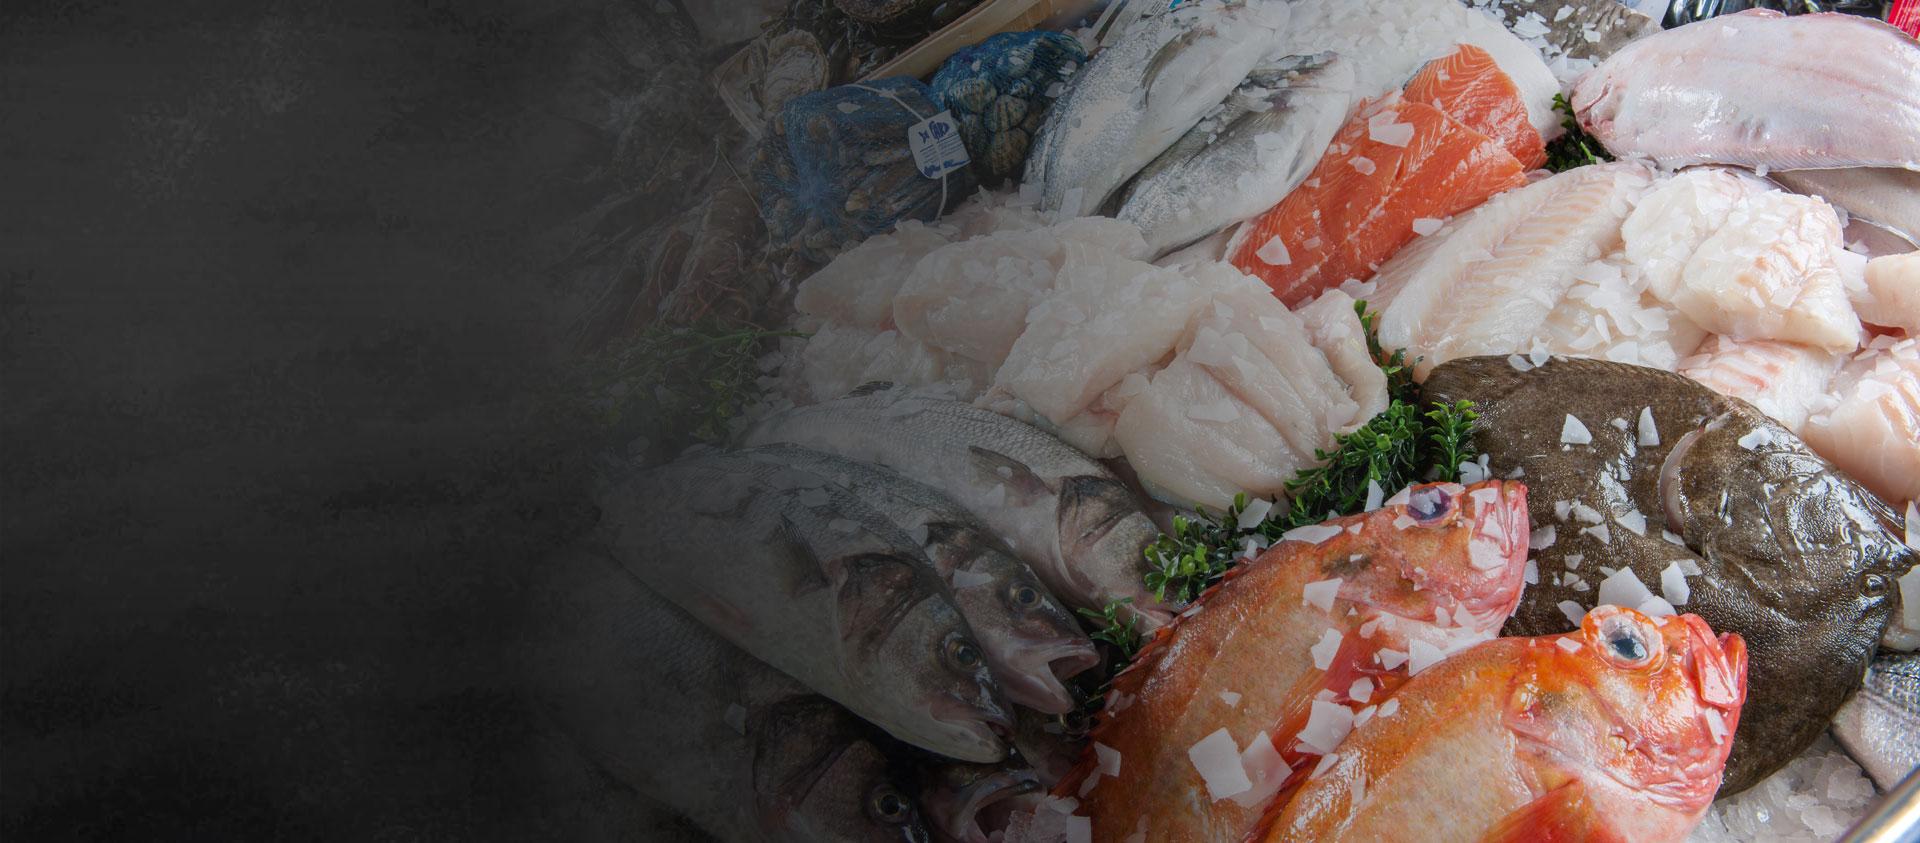 vishandel-volendam-zoetermeer-slider